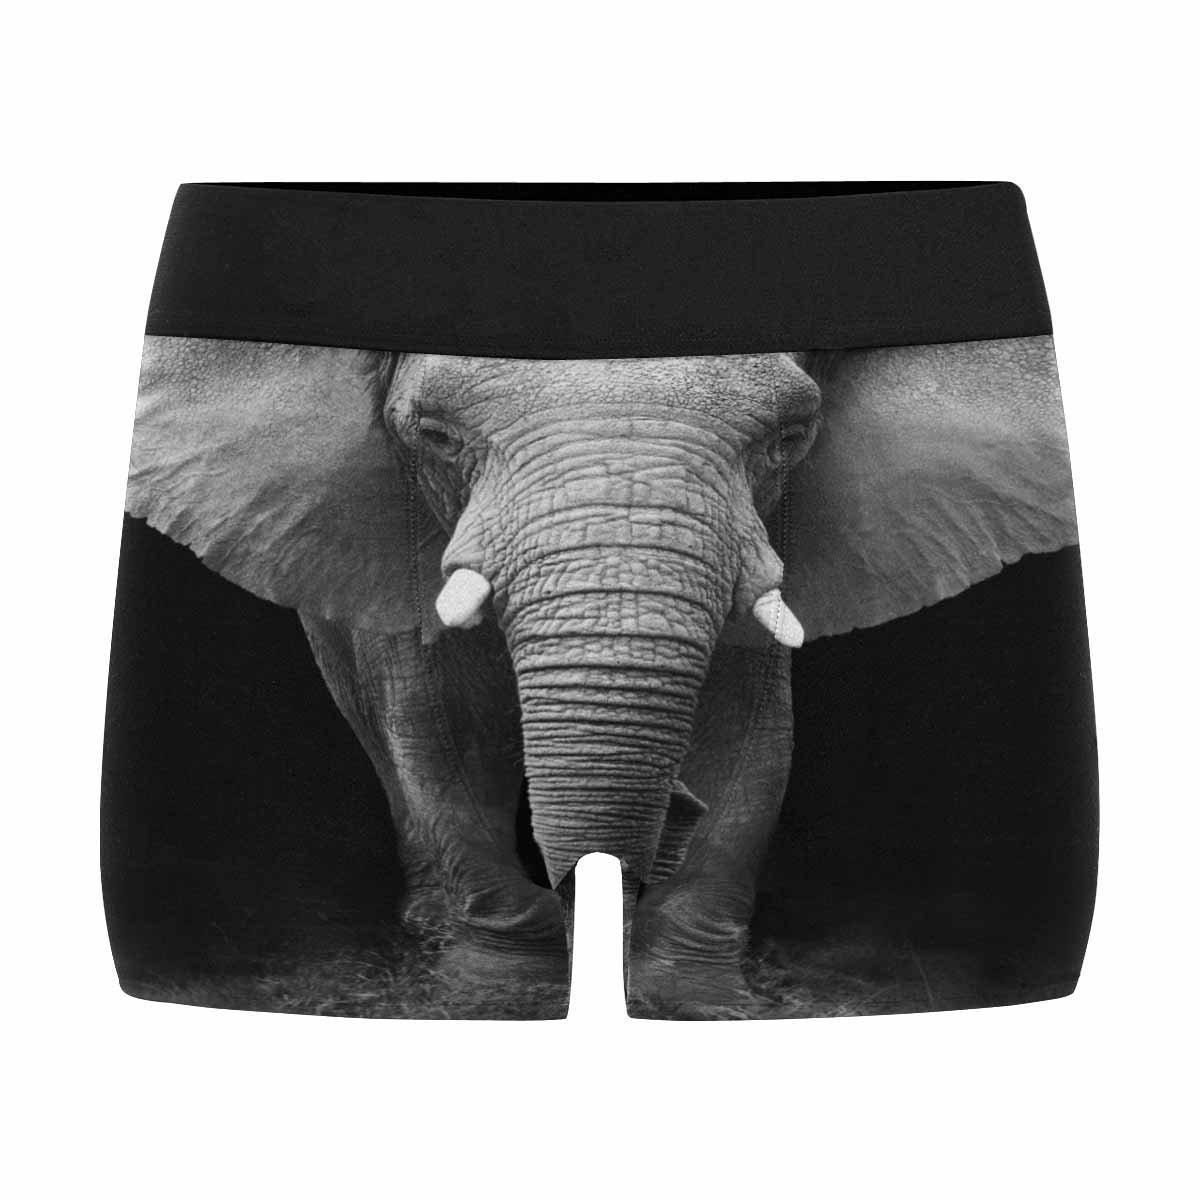 INTERESTPRINT Boxer Briefs Mens Underwear Elephant XS-3XL